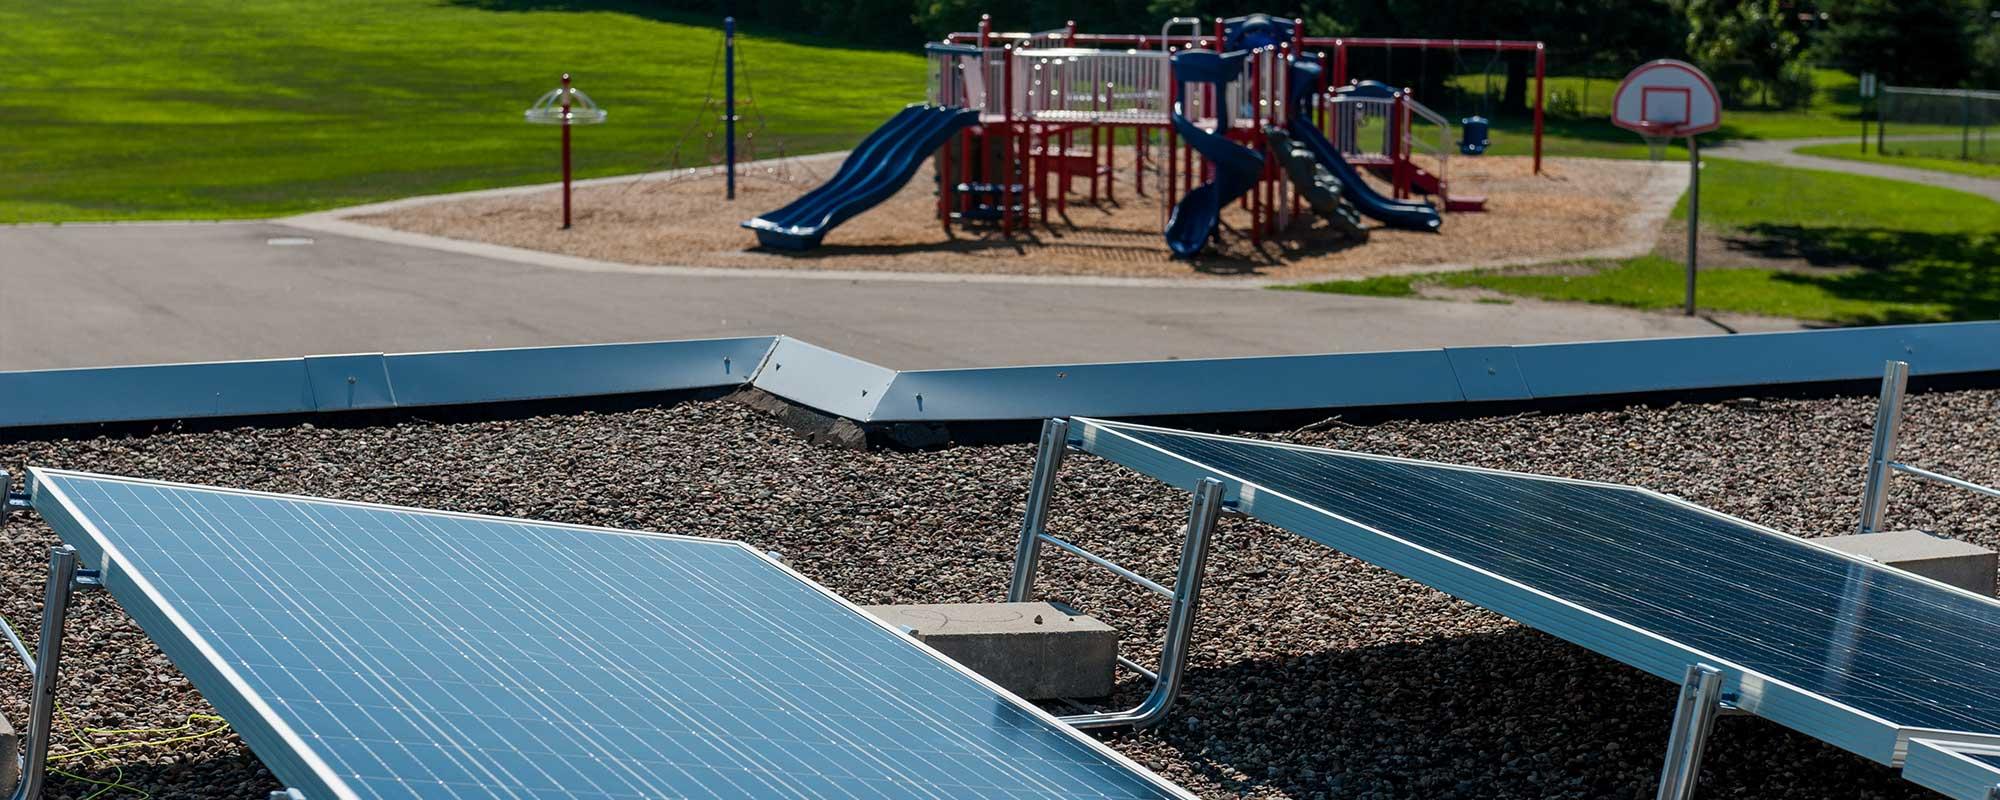 SCHOOL | Snail Lake Kindergarten | Shoreview, MN | 40 kW System